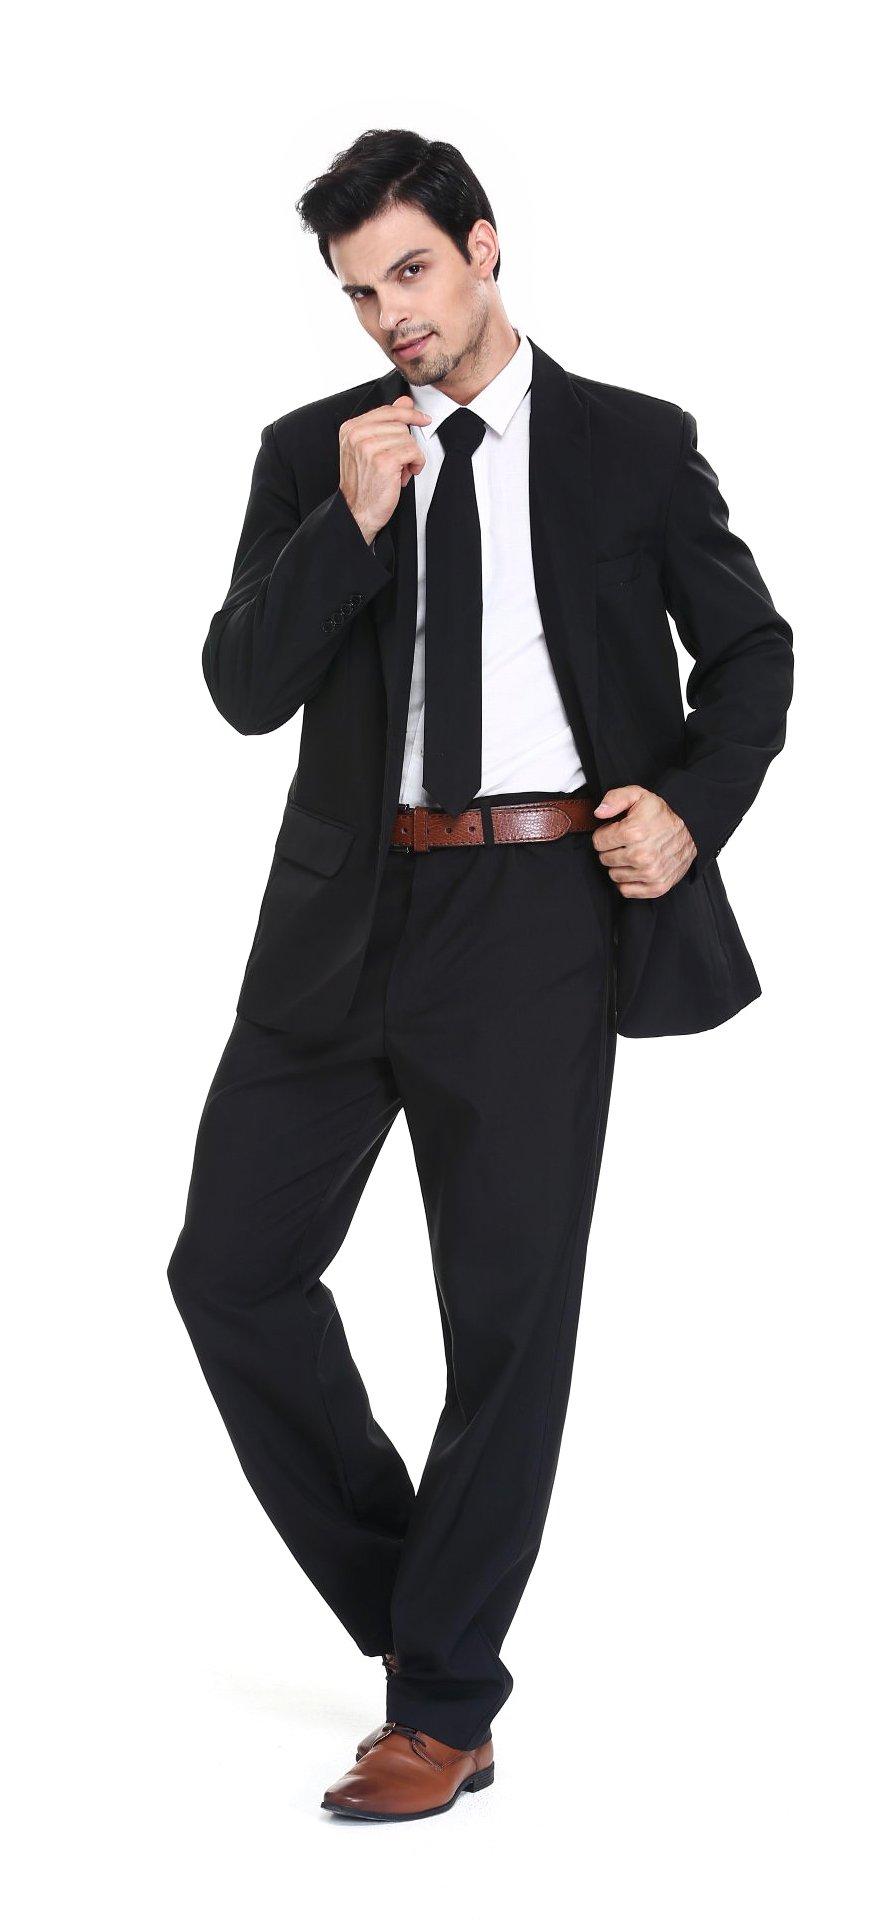 U LOOK UGLY TODAY Men's Party Suit Black Solid Color Bachelor Party Suit-Large